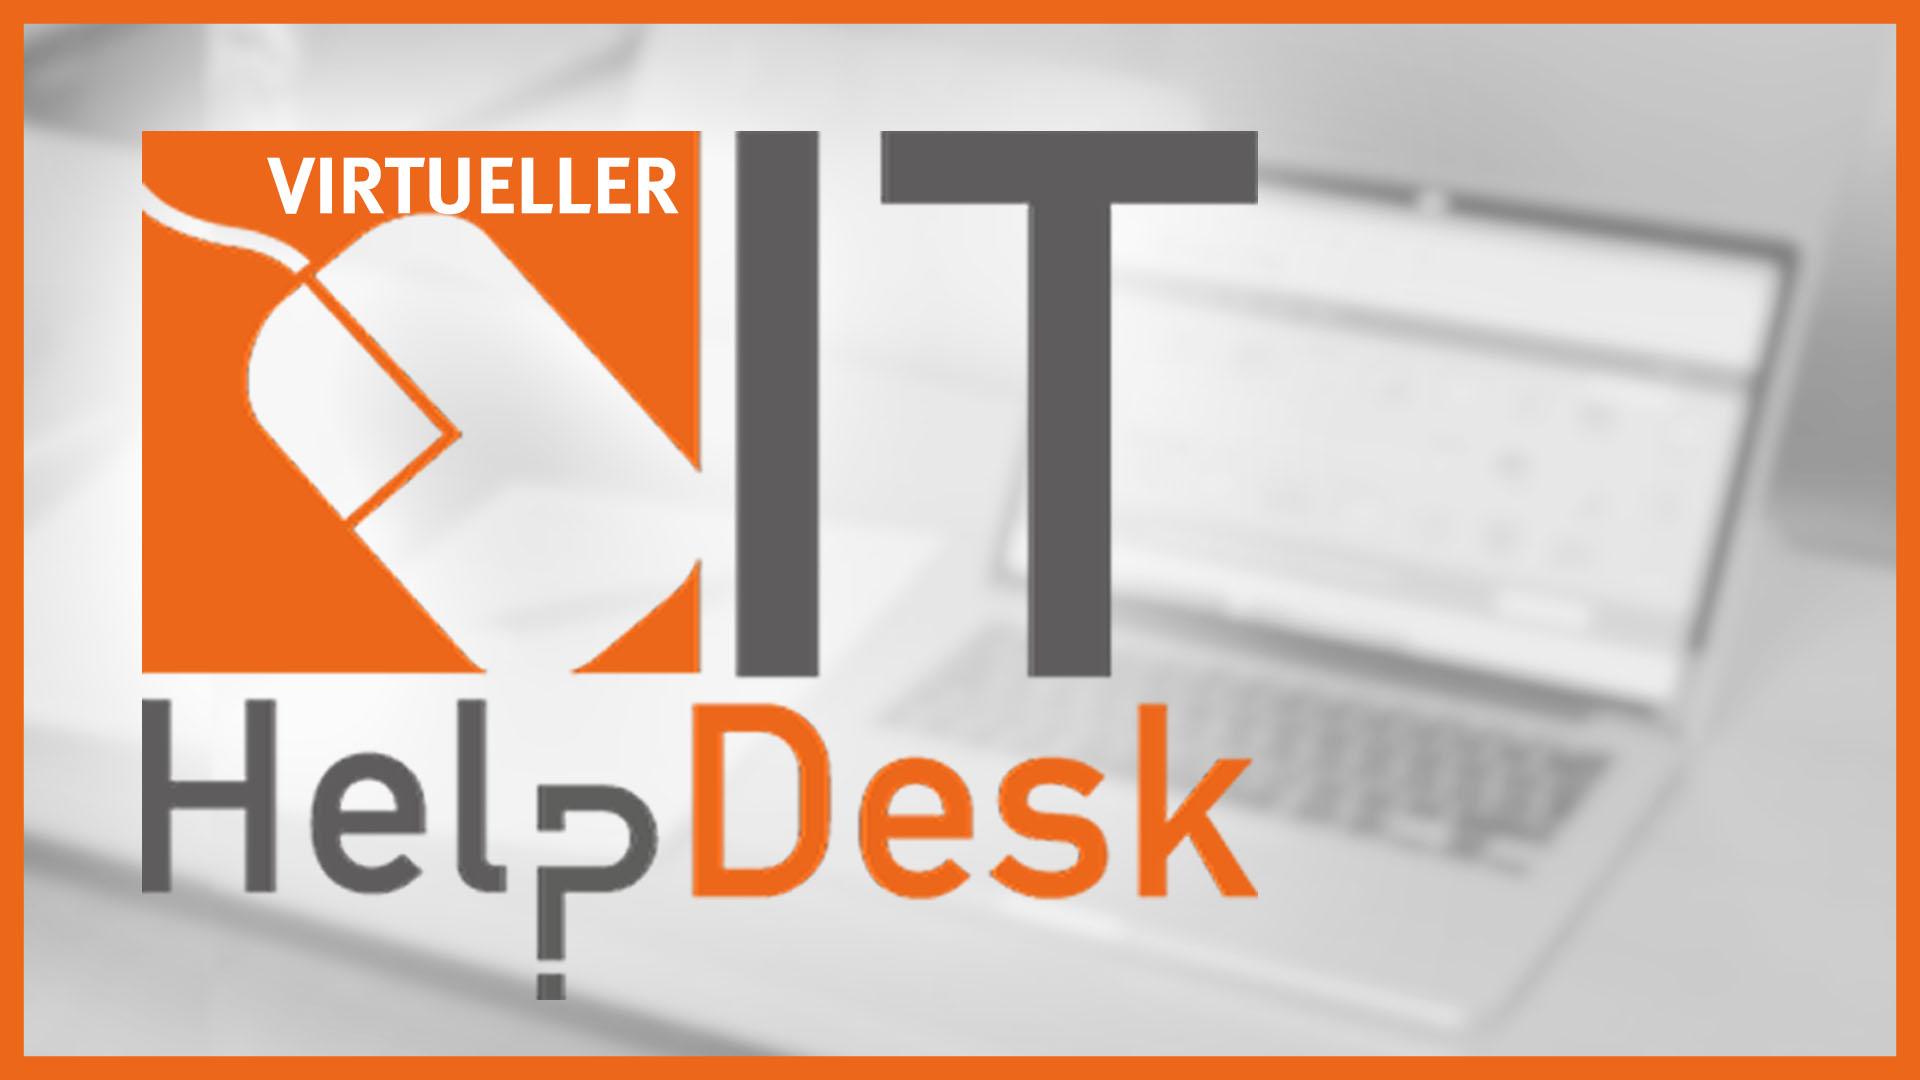 IT-HelpDesk virtuell